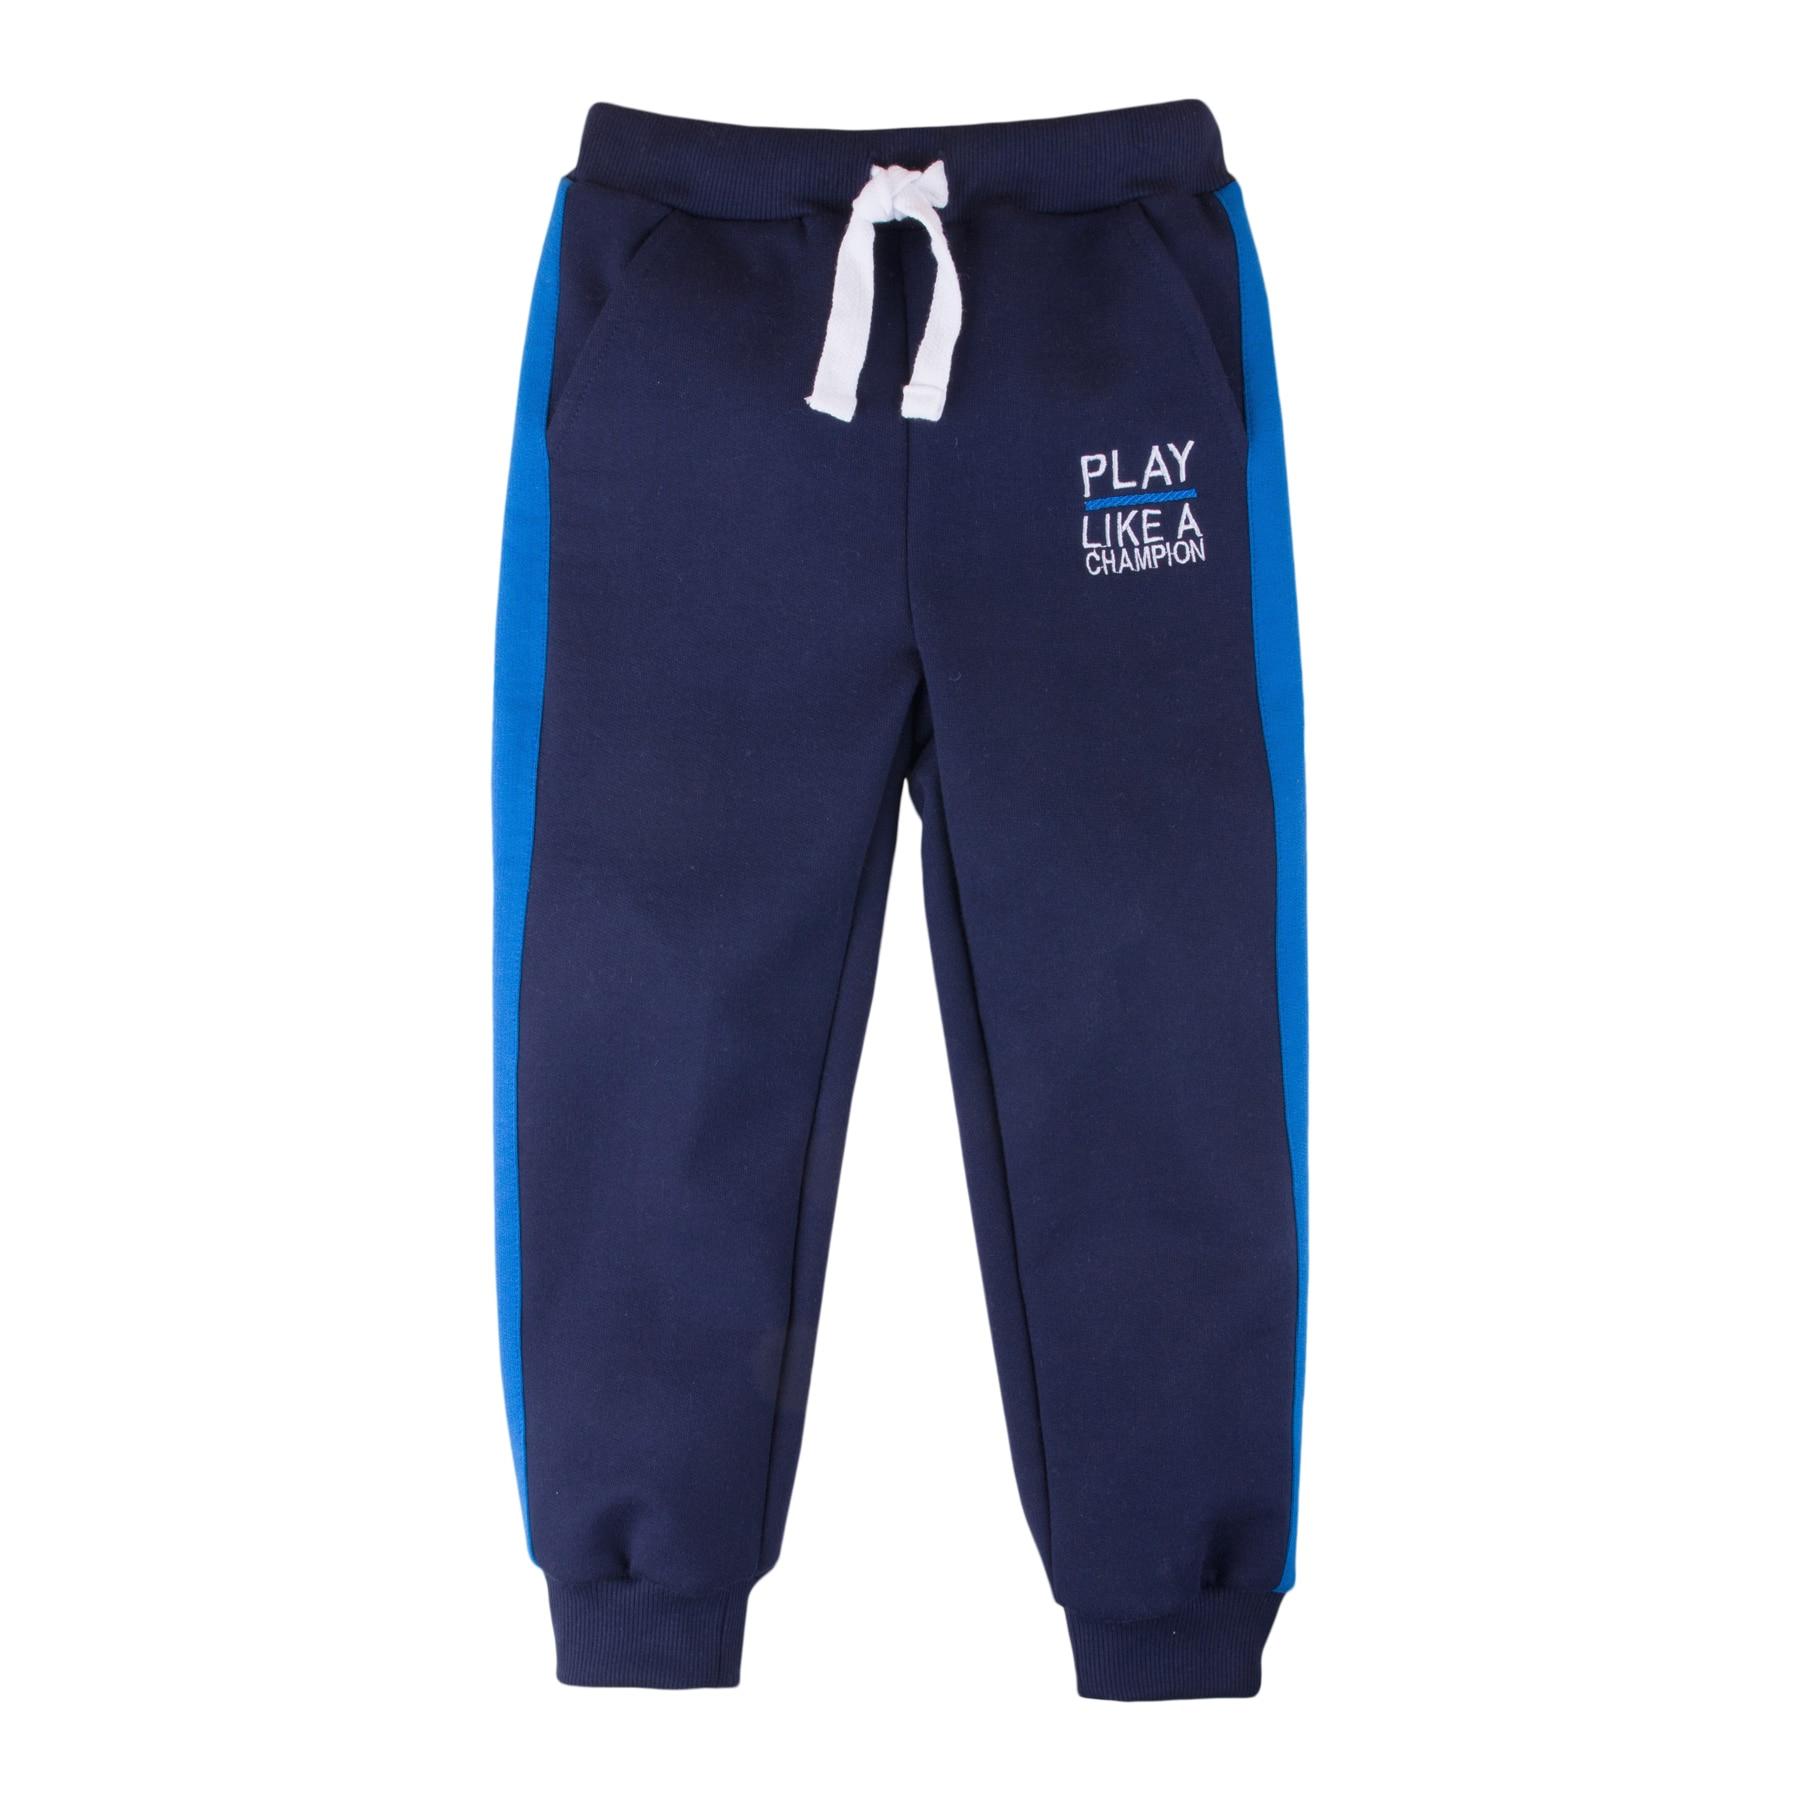 Pants for boy BOSSA NOVA 487B-462c kid clothes pants for girls bossa nova 487b 462b kid clothes